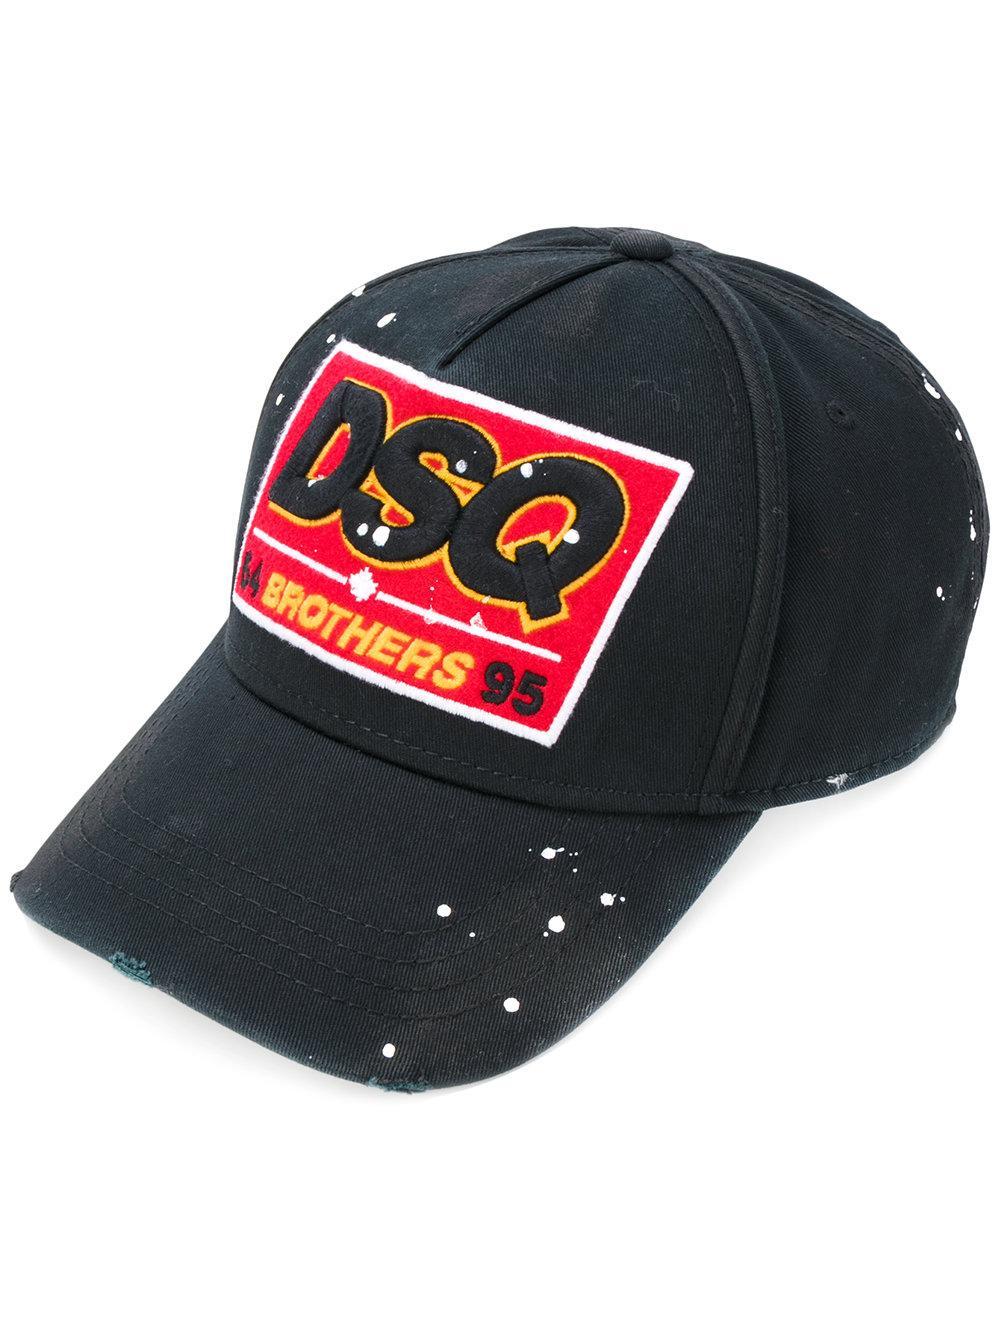 Dsquared 178 Dsq Patch Baseball Cap In Black For Men Lyst